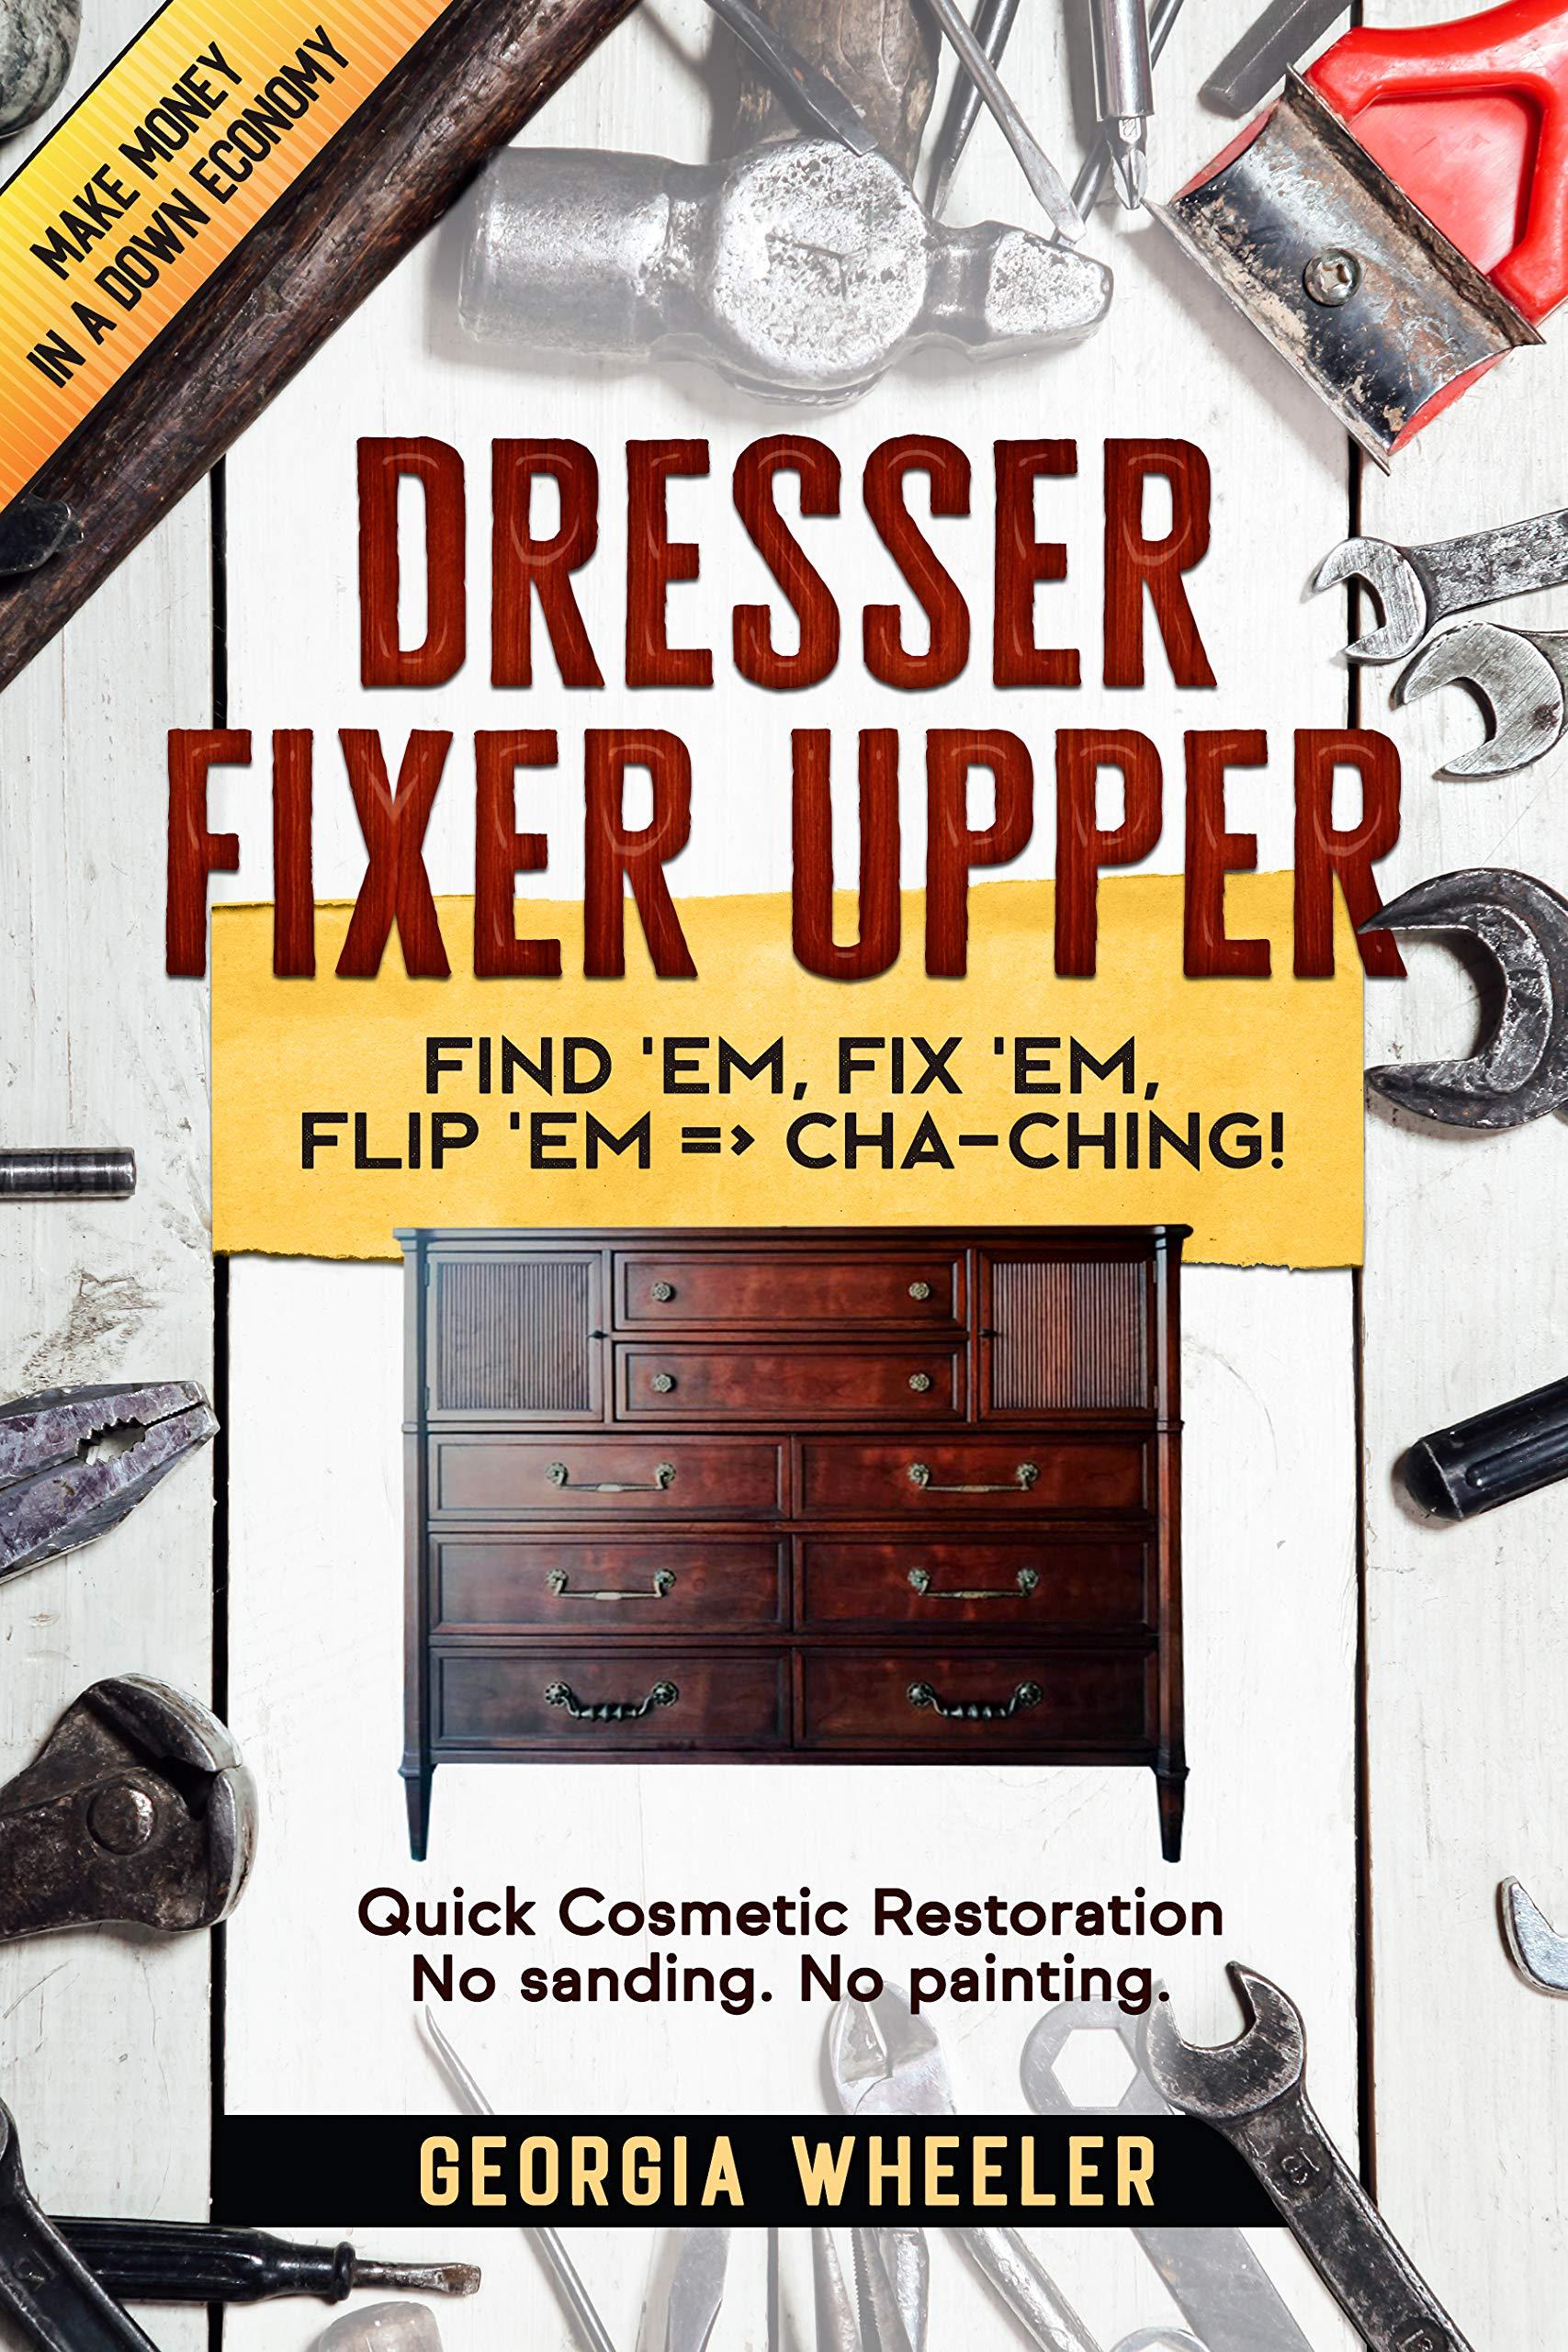 Dresser Fixer Upper: Find 'em, Fix 'em, Flip 'em => Cha-Ching!